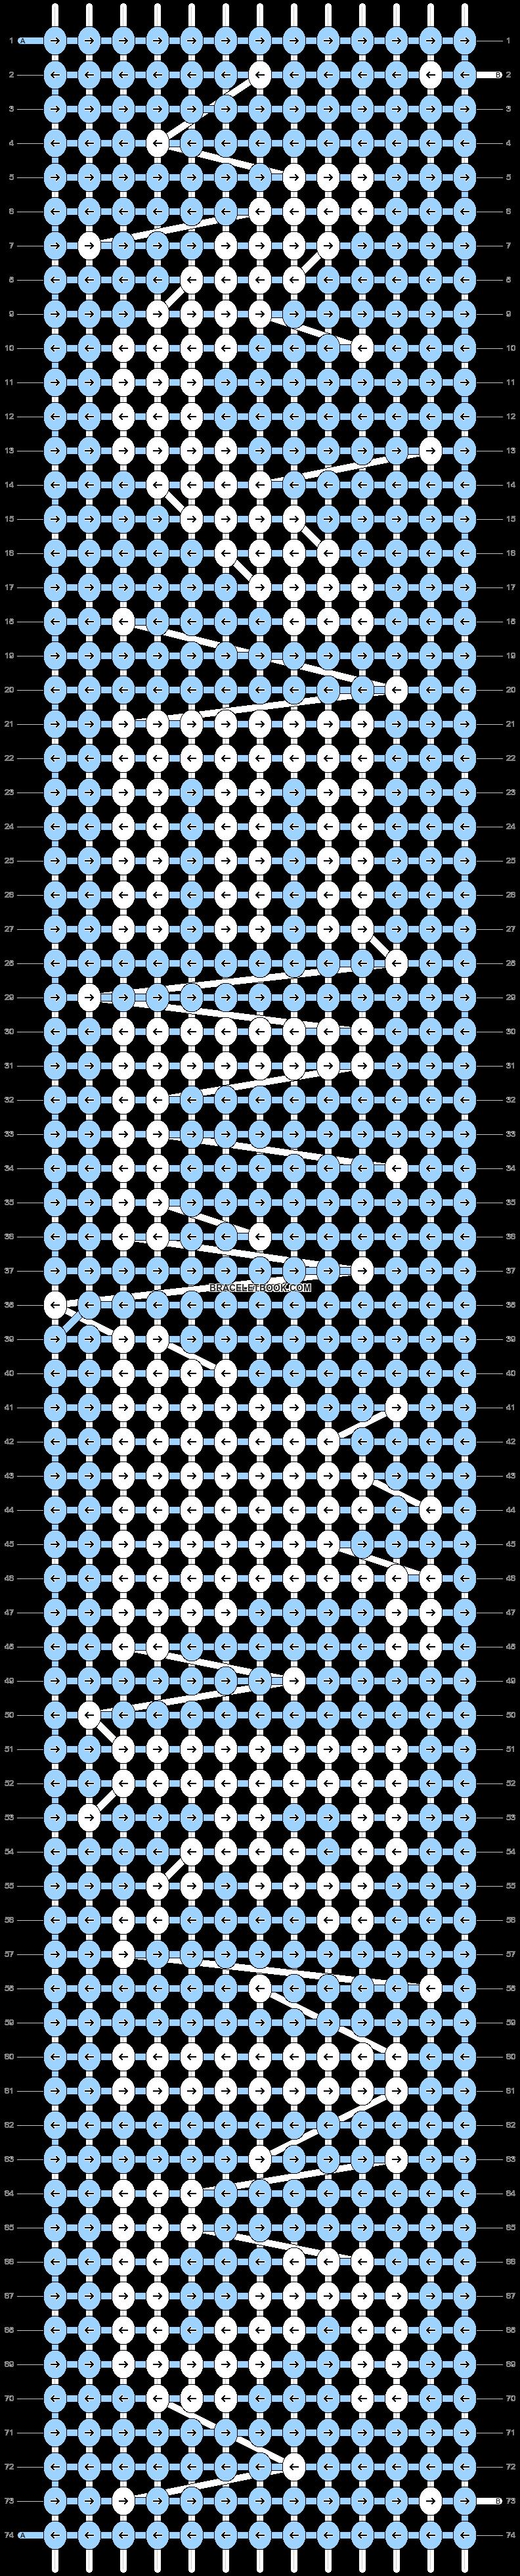 Alpha pattern #86644 pattern